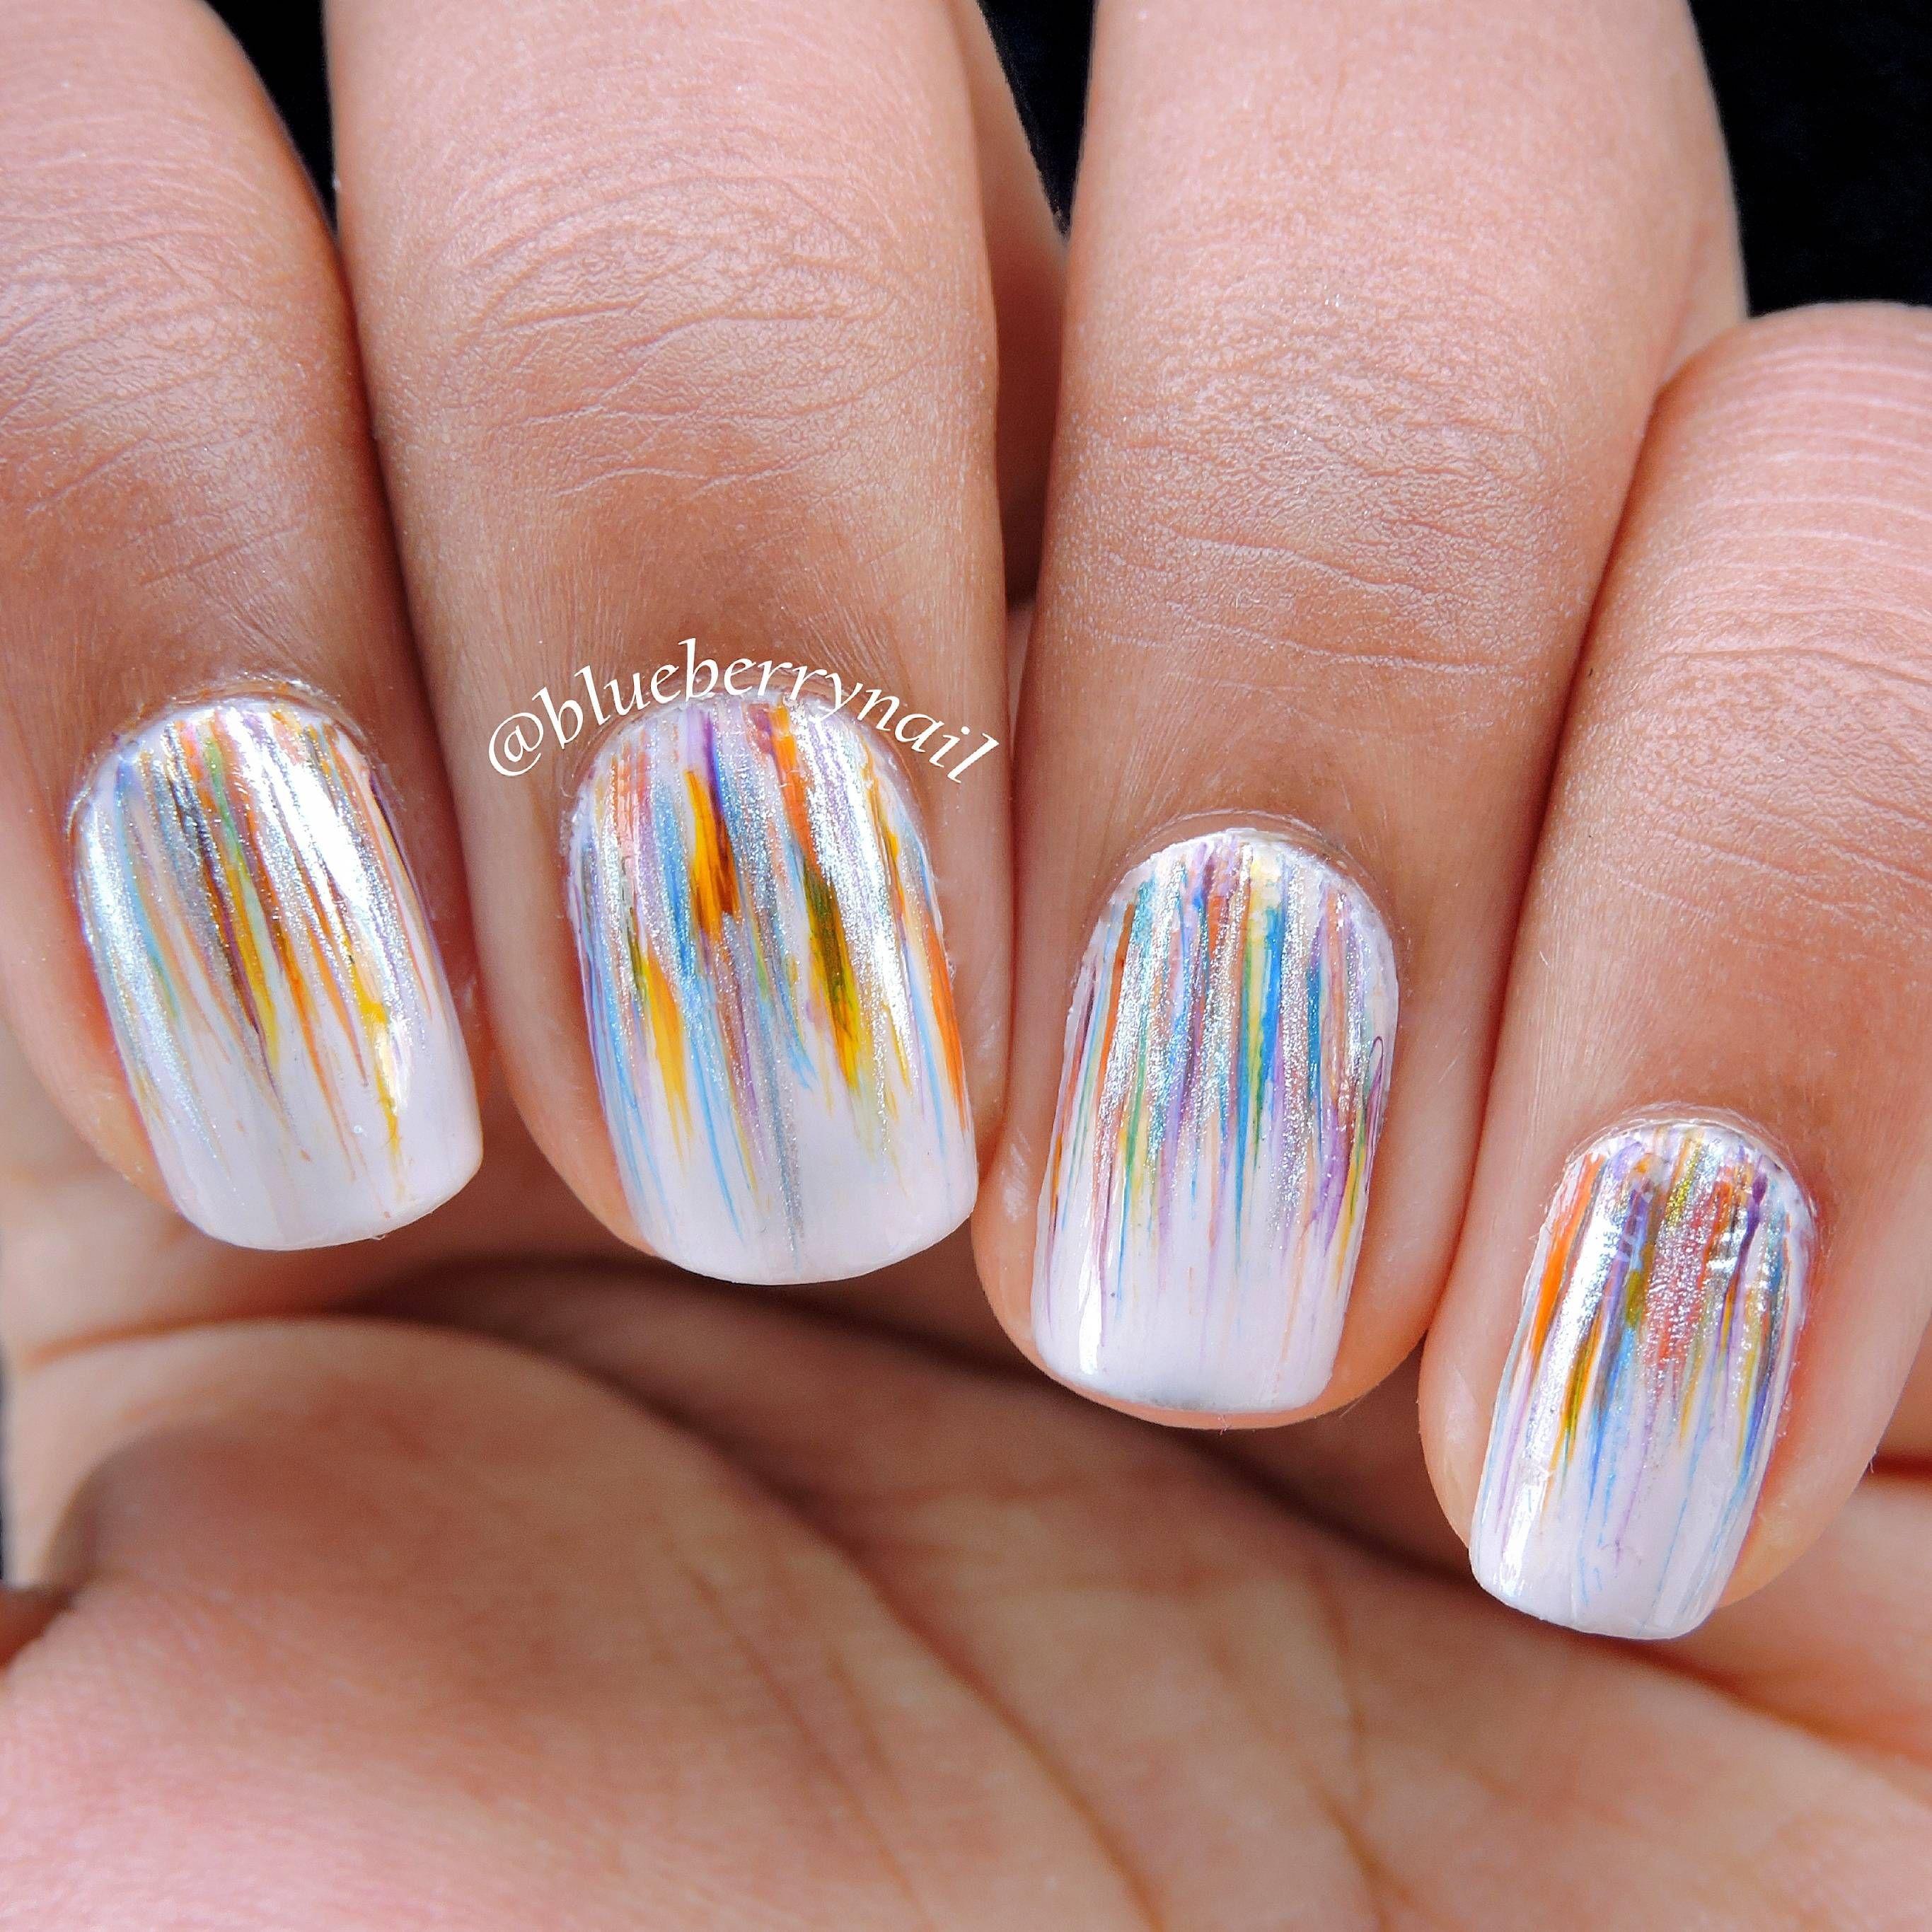 Colourful fan brush nails | Fan brush nails and Fan brush